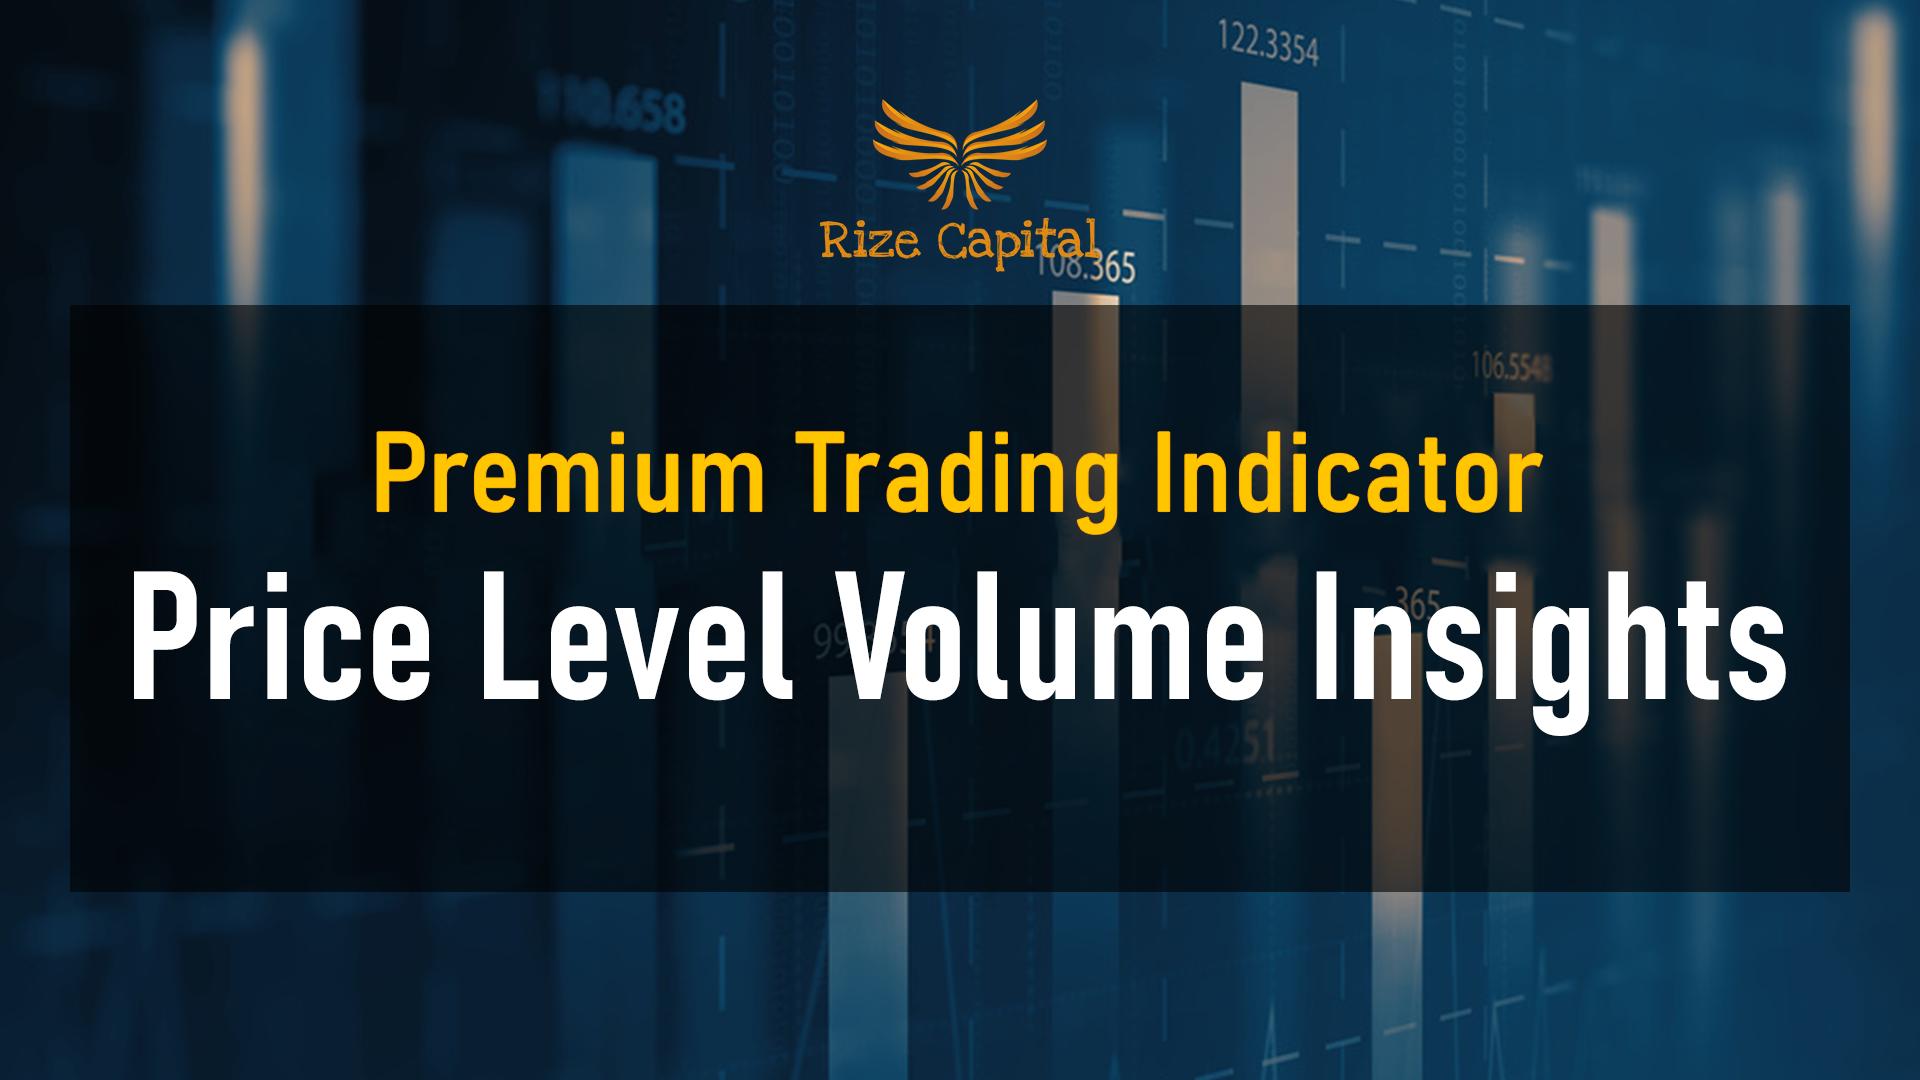 Price Level Volume Insights indicator